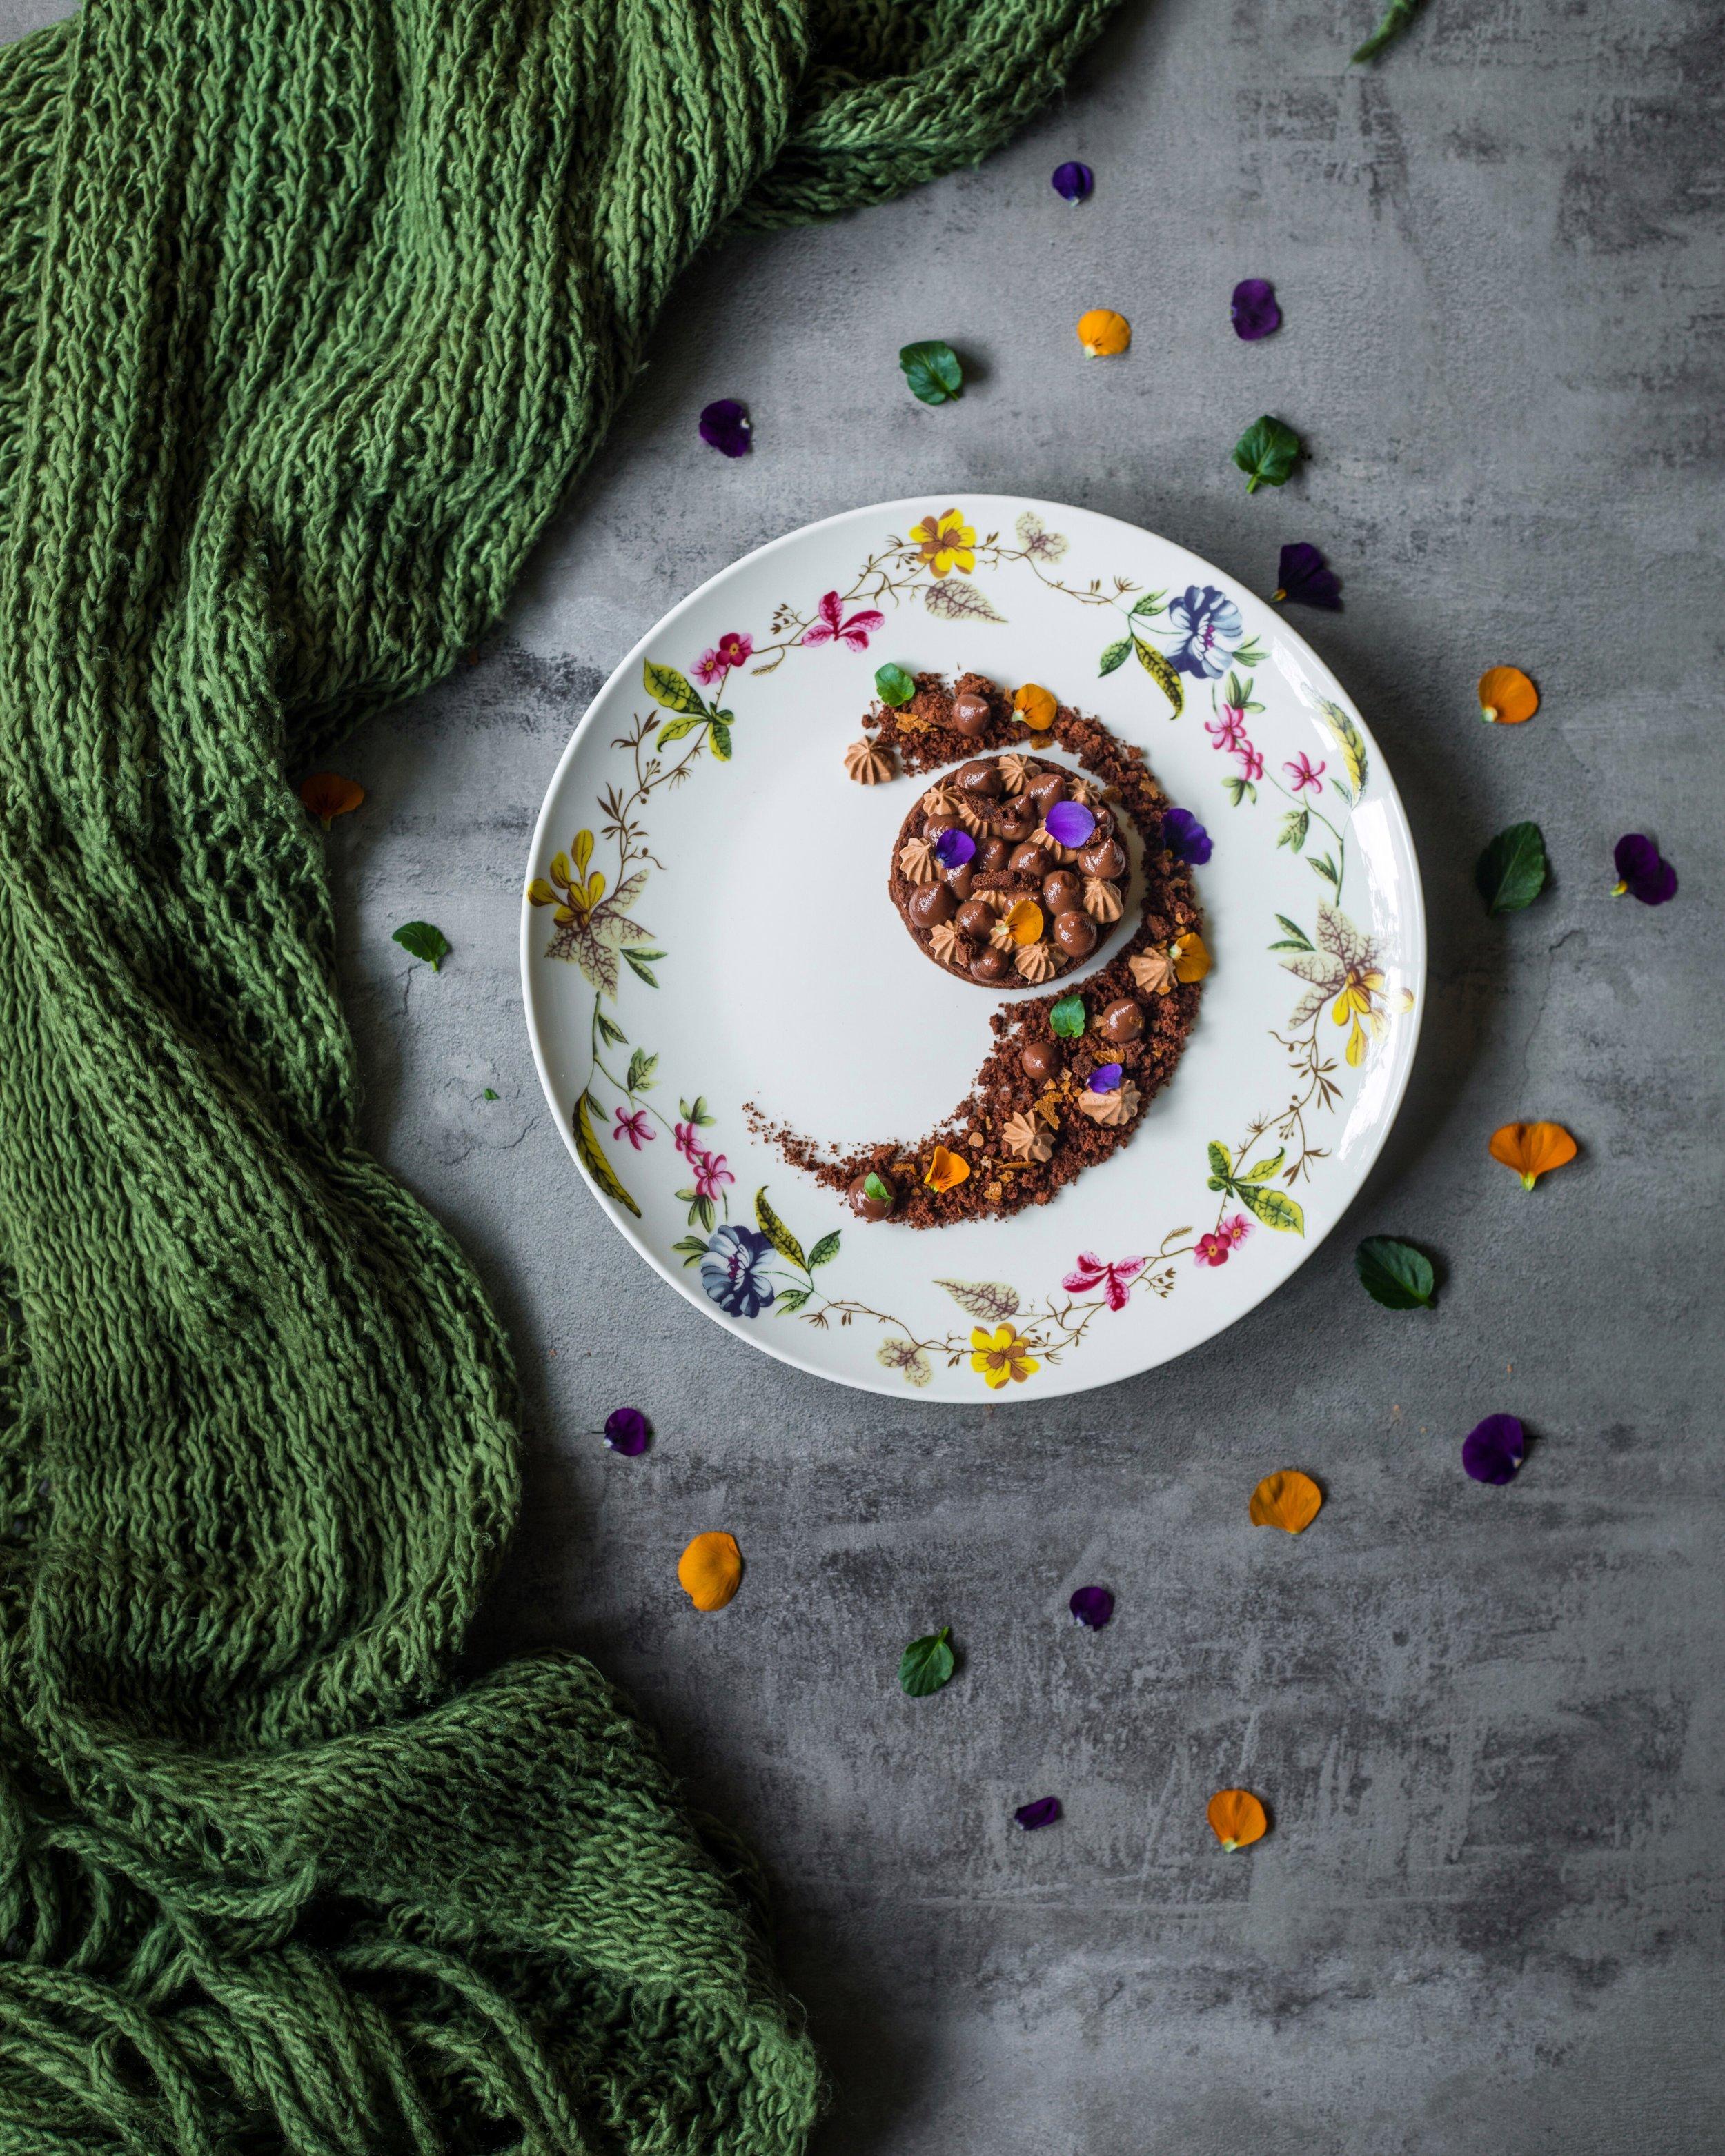 Ebinger's blackout cake first option: Dessert à l'assiette